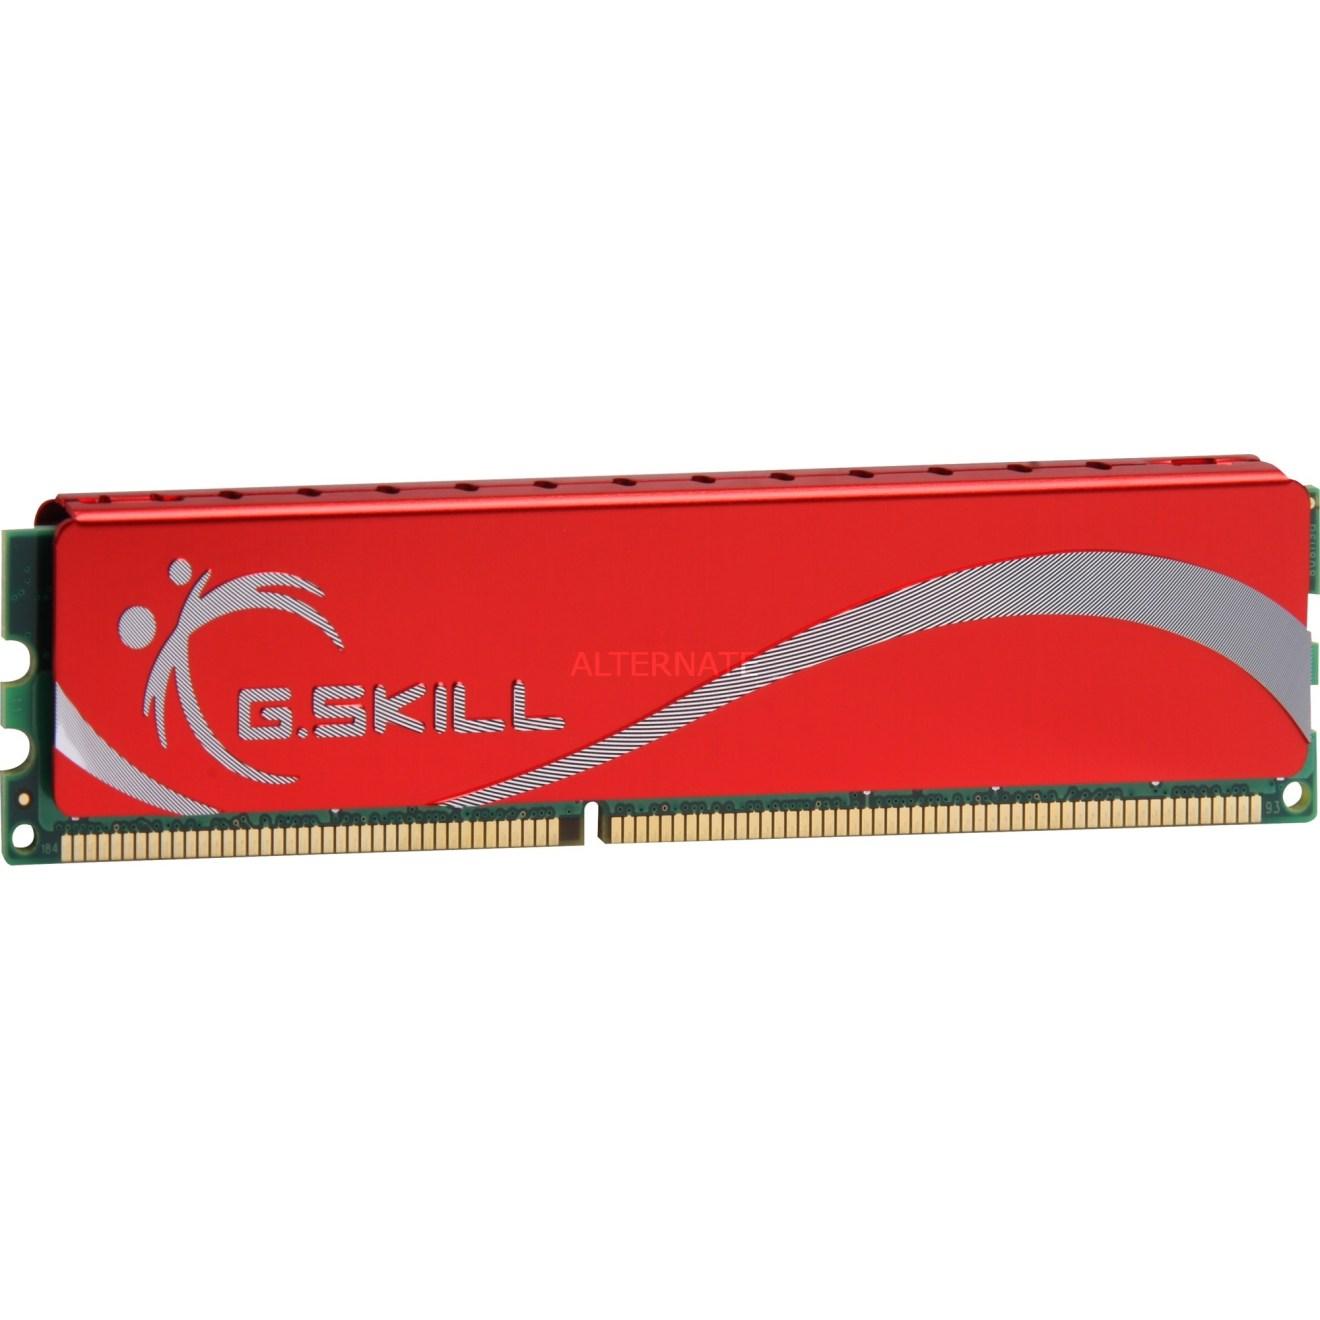 DIMM 1 GB DDR-400, Mémoire Acer Aspire E 15 E5-575G-53VG Laptop, 15.6 Full HD (Intel Core i5, NVIDIA 940MX, 8GB DDR4, 256GB SSD, Windows 10) Acer Aspire E 15 E5-575G-53VG Laptop, 15.6 Full HD (Intel Core i5, NVIDIA 940MX, 8GB DDR4, 256GB SSD, Windows 10) G Skill DIMM 1 GB DDR 400  M moire  iaidg6